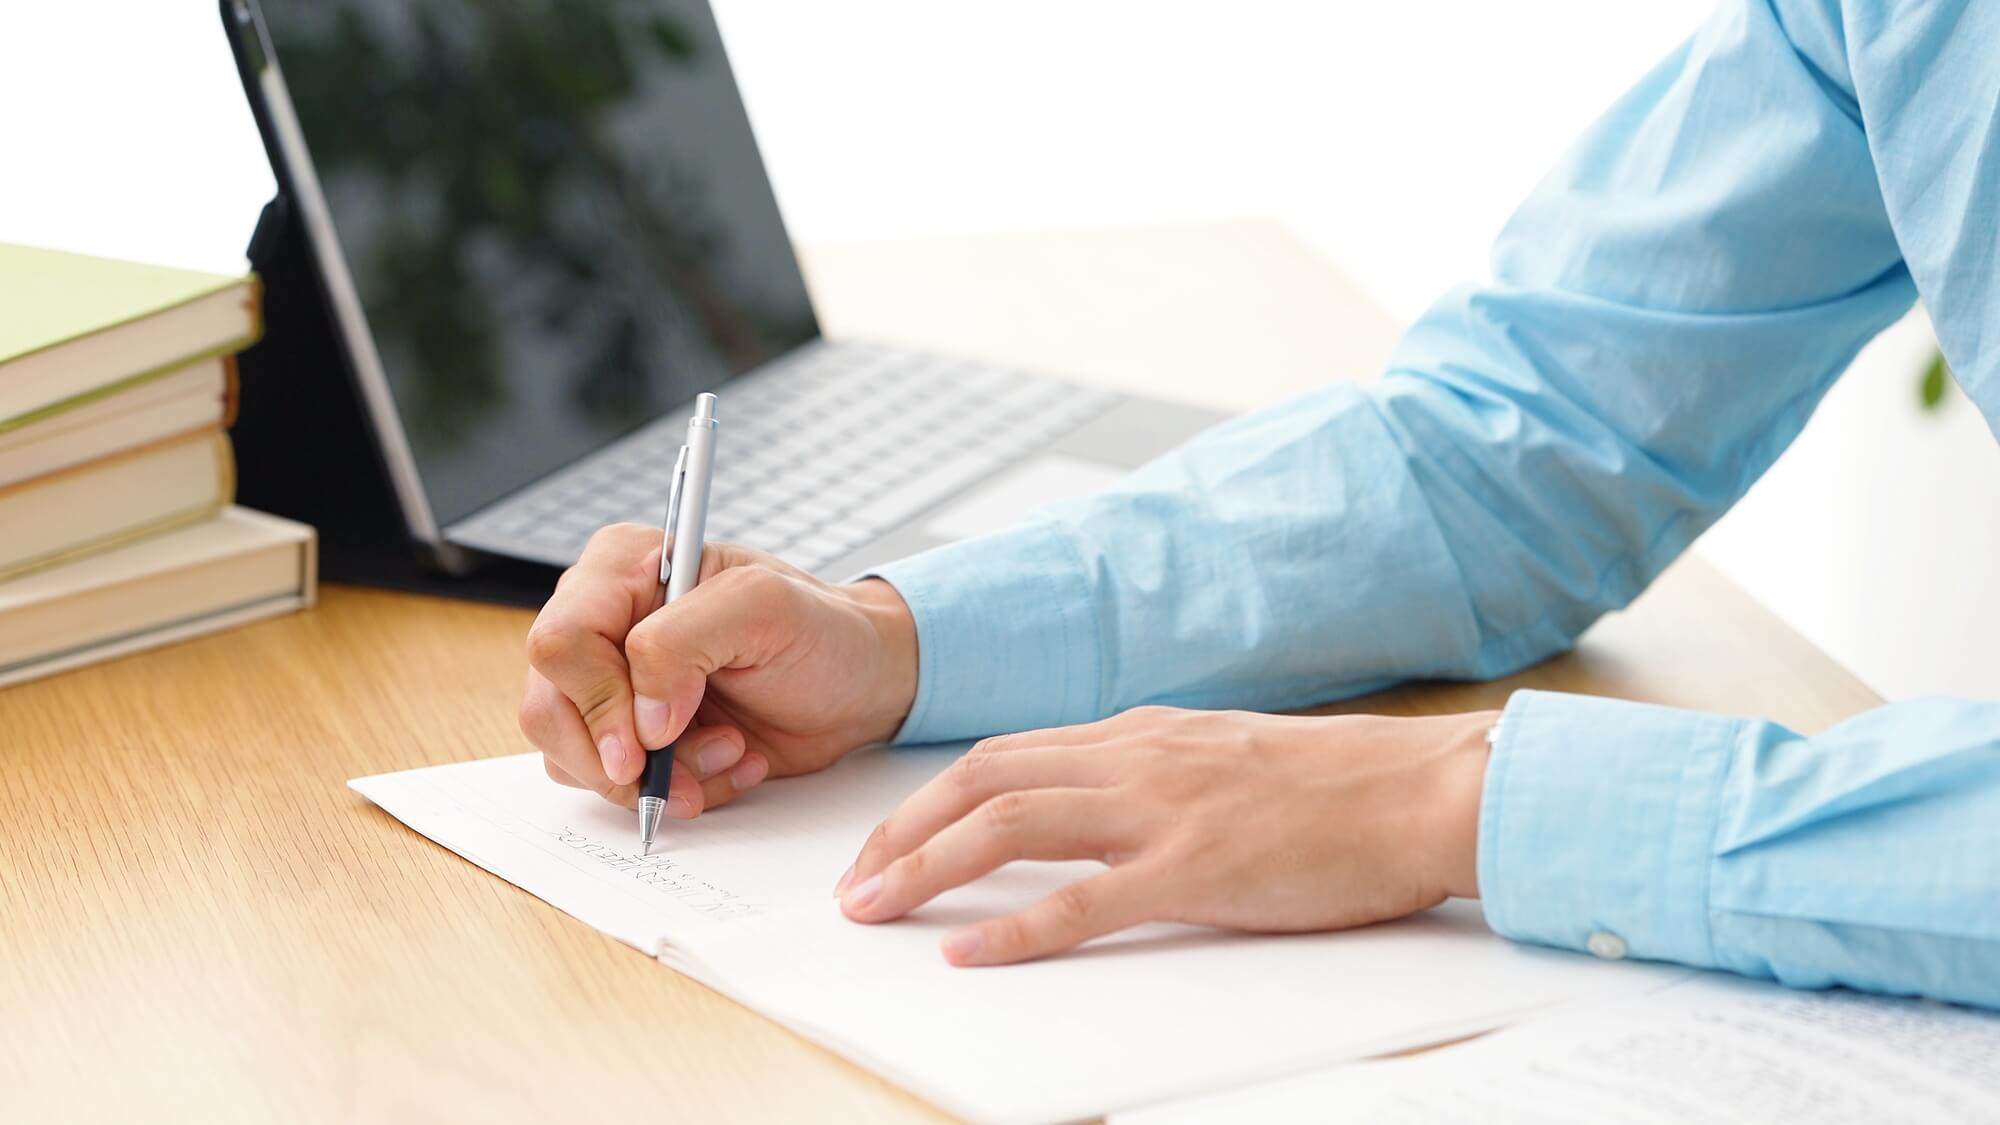 電気通信工事施工管理技士試験の難易度と勉強法